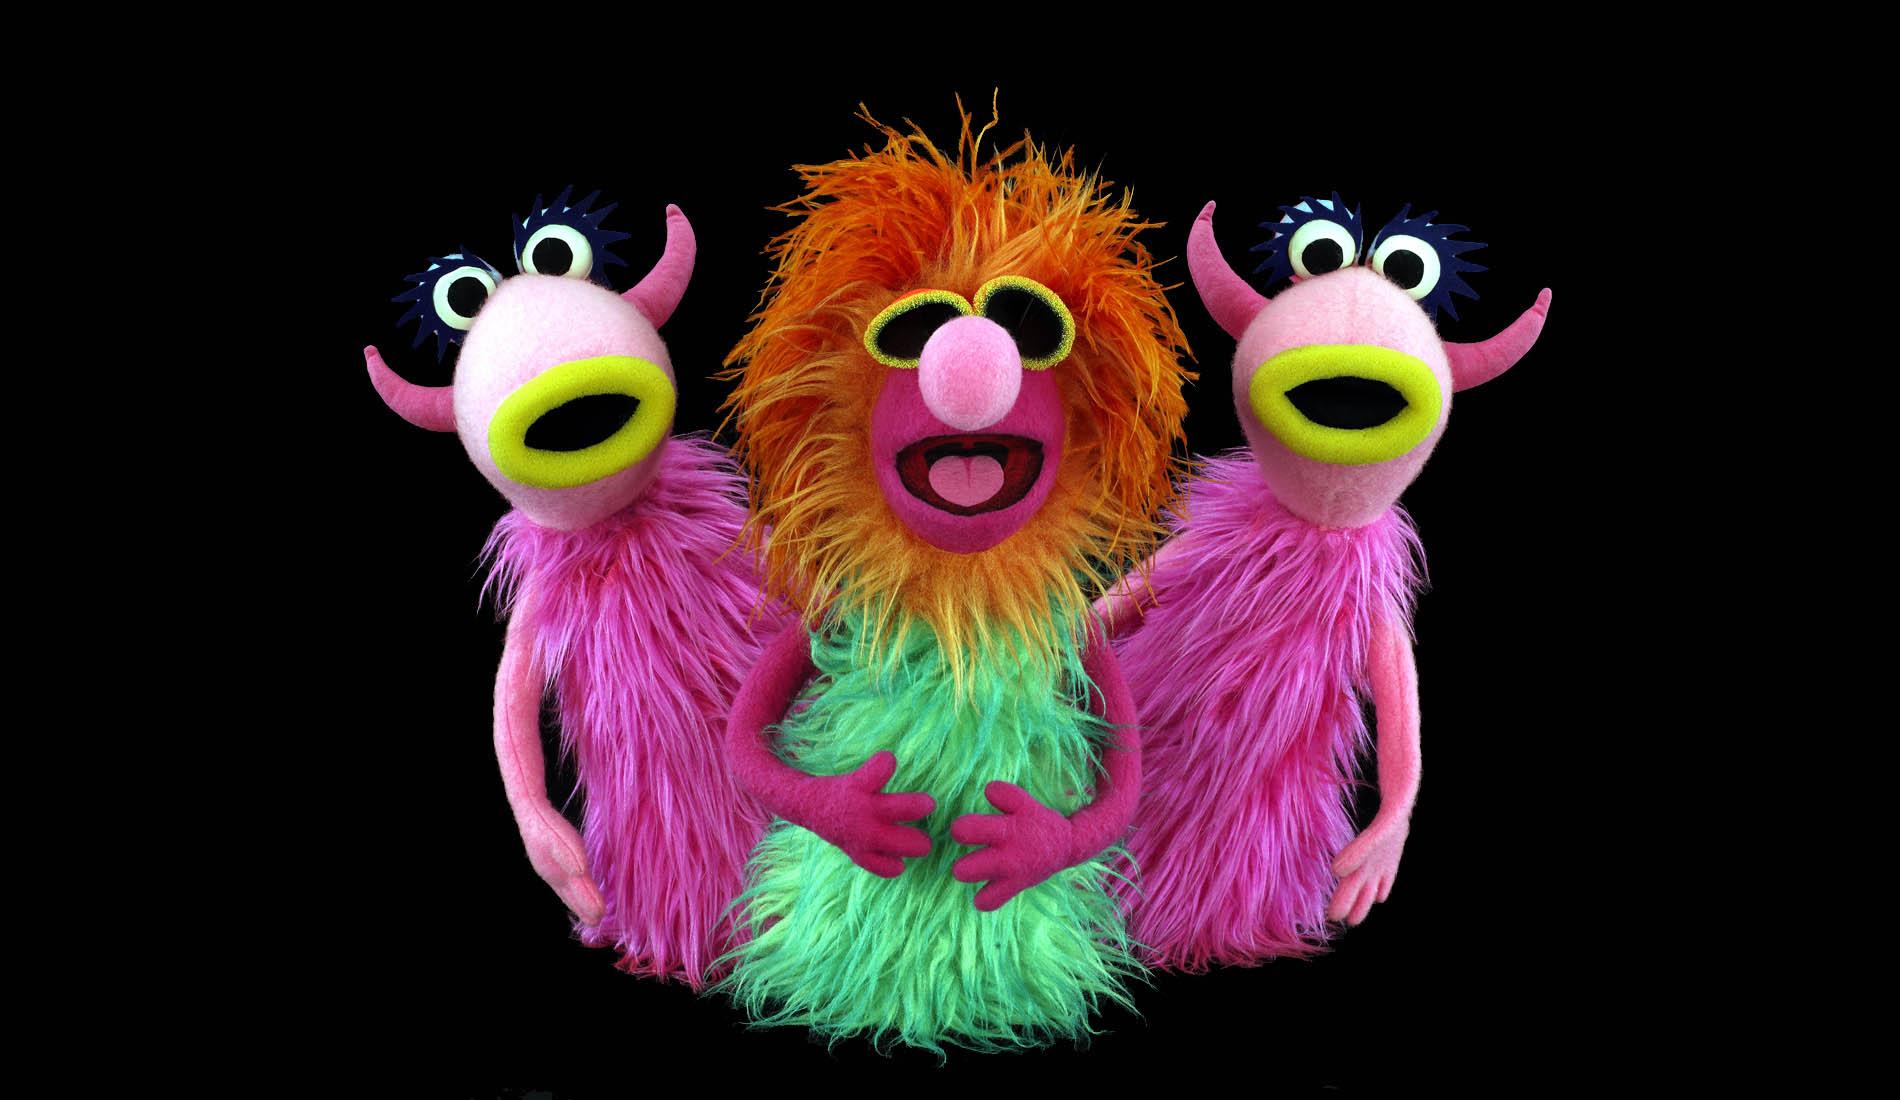 animal muppets wallpaper - photo #25